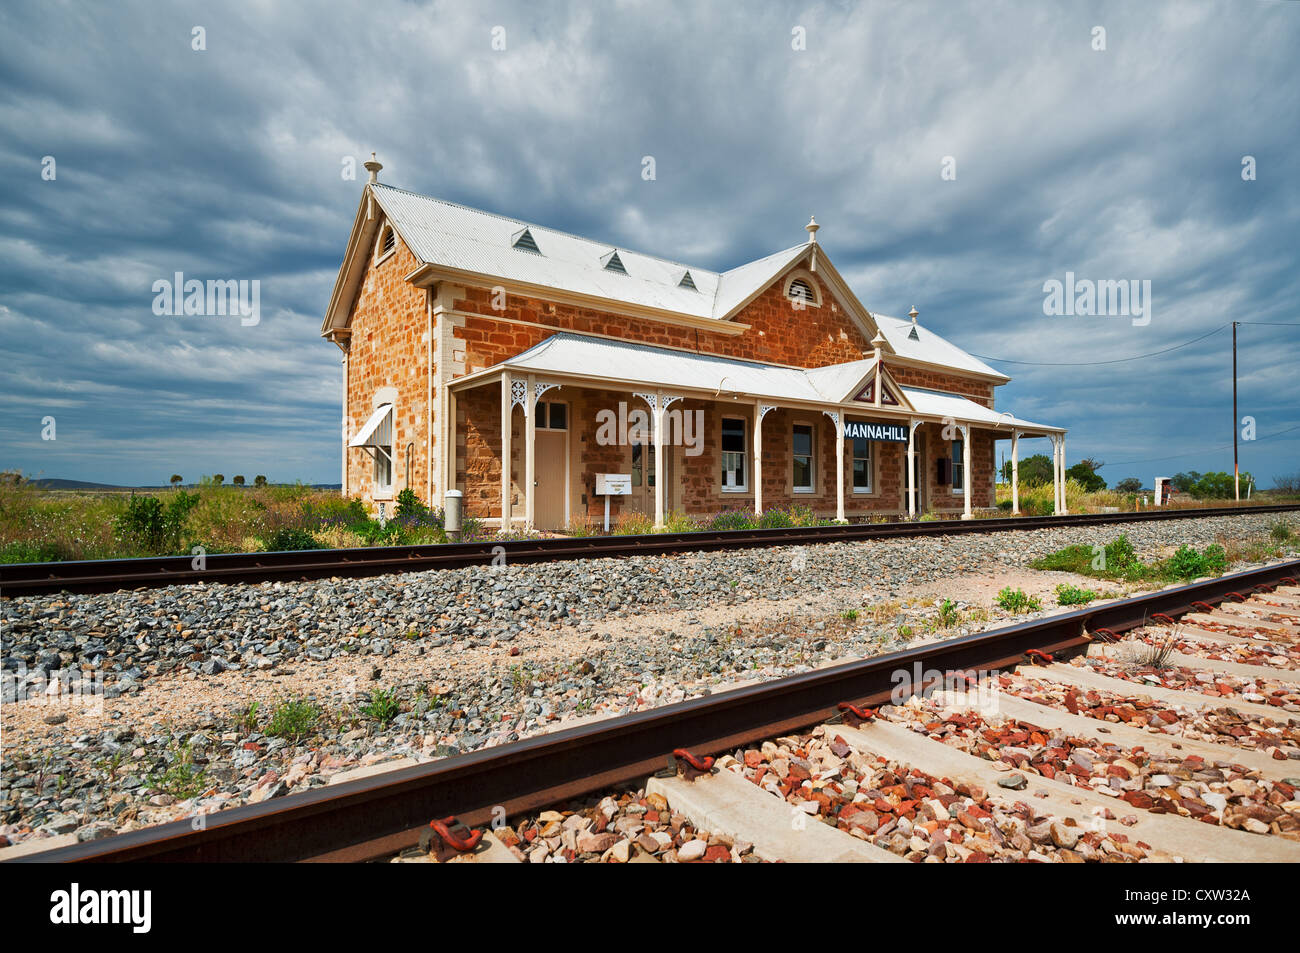 Old Mannahill Railway Station under dark clouds - Stock Image